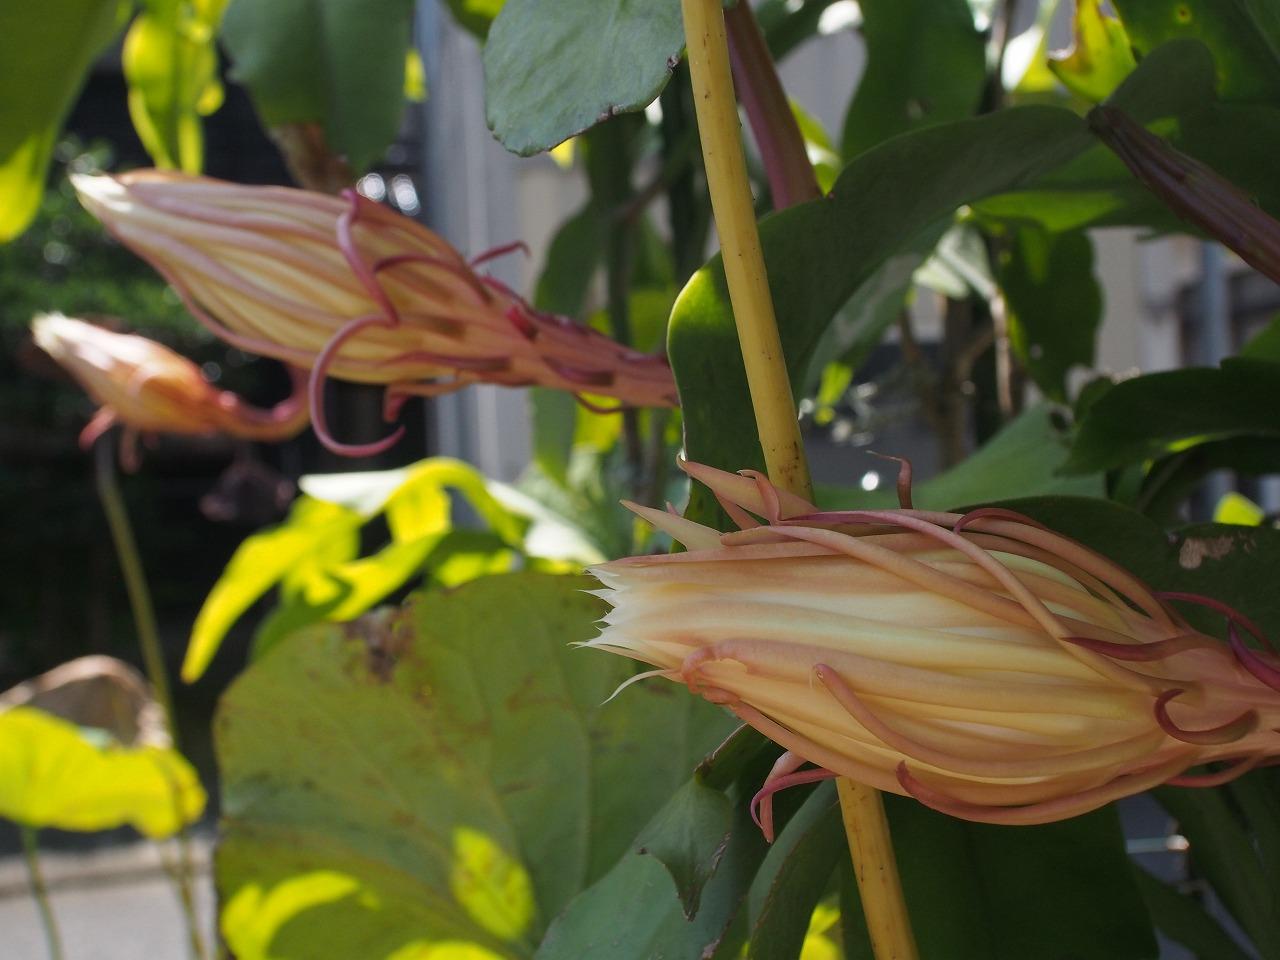 20170909-EpiphyllumOxpetalum-O02.jpg